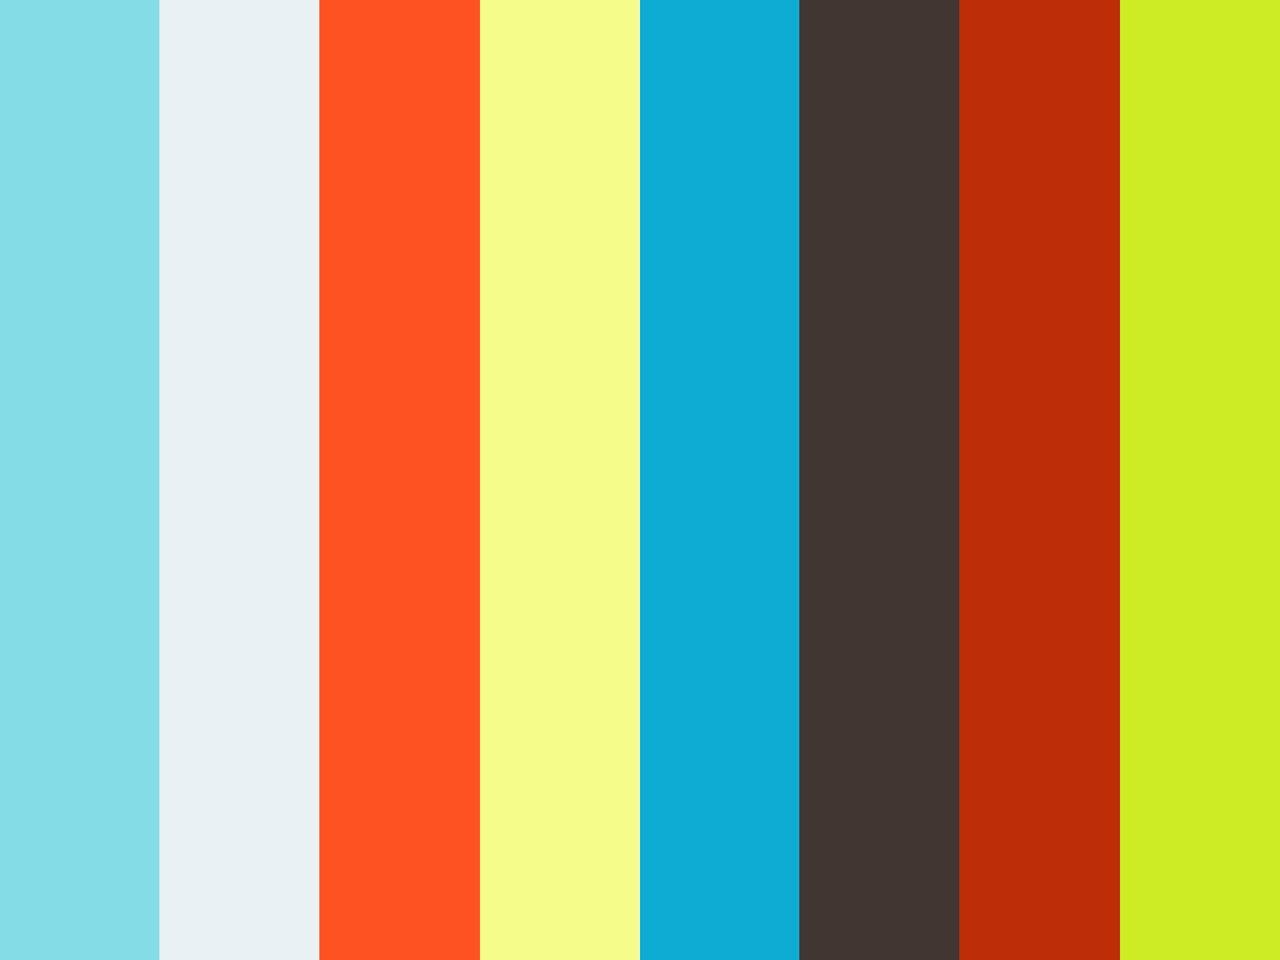 【SDE微電影】弘霈 & 芷瑋︱婚禮微電影︱高雄白屋證婚︱高雄翰品酒店︱當日快剪快播SDE-上篇(一進放)